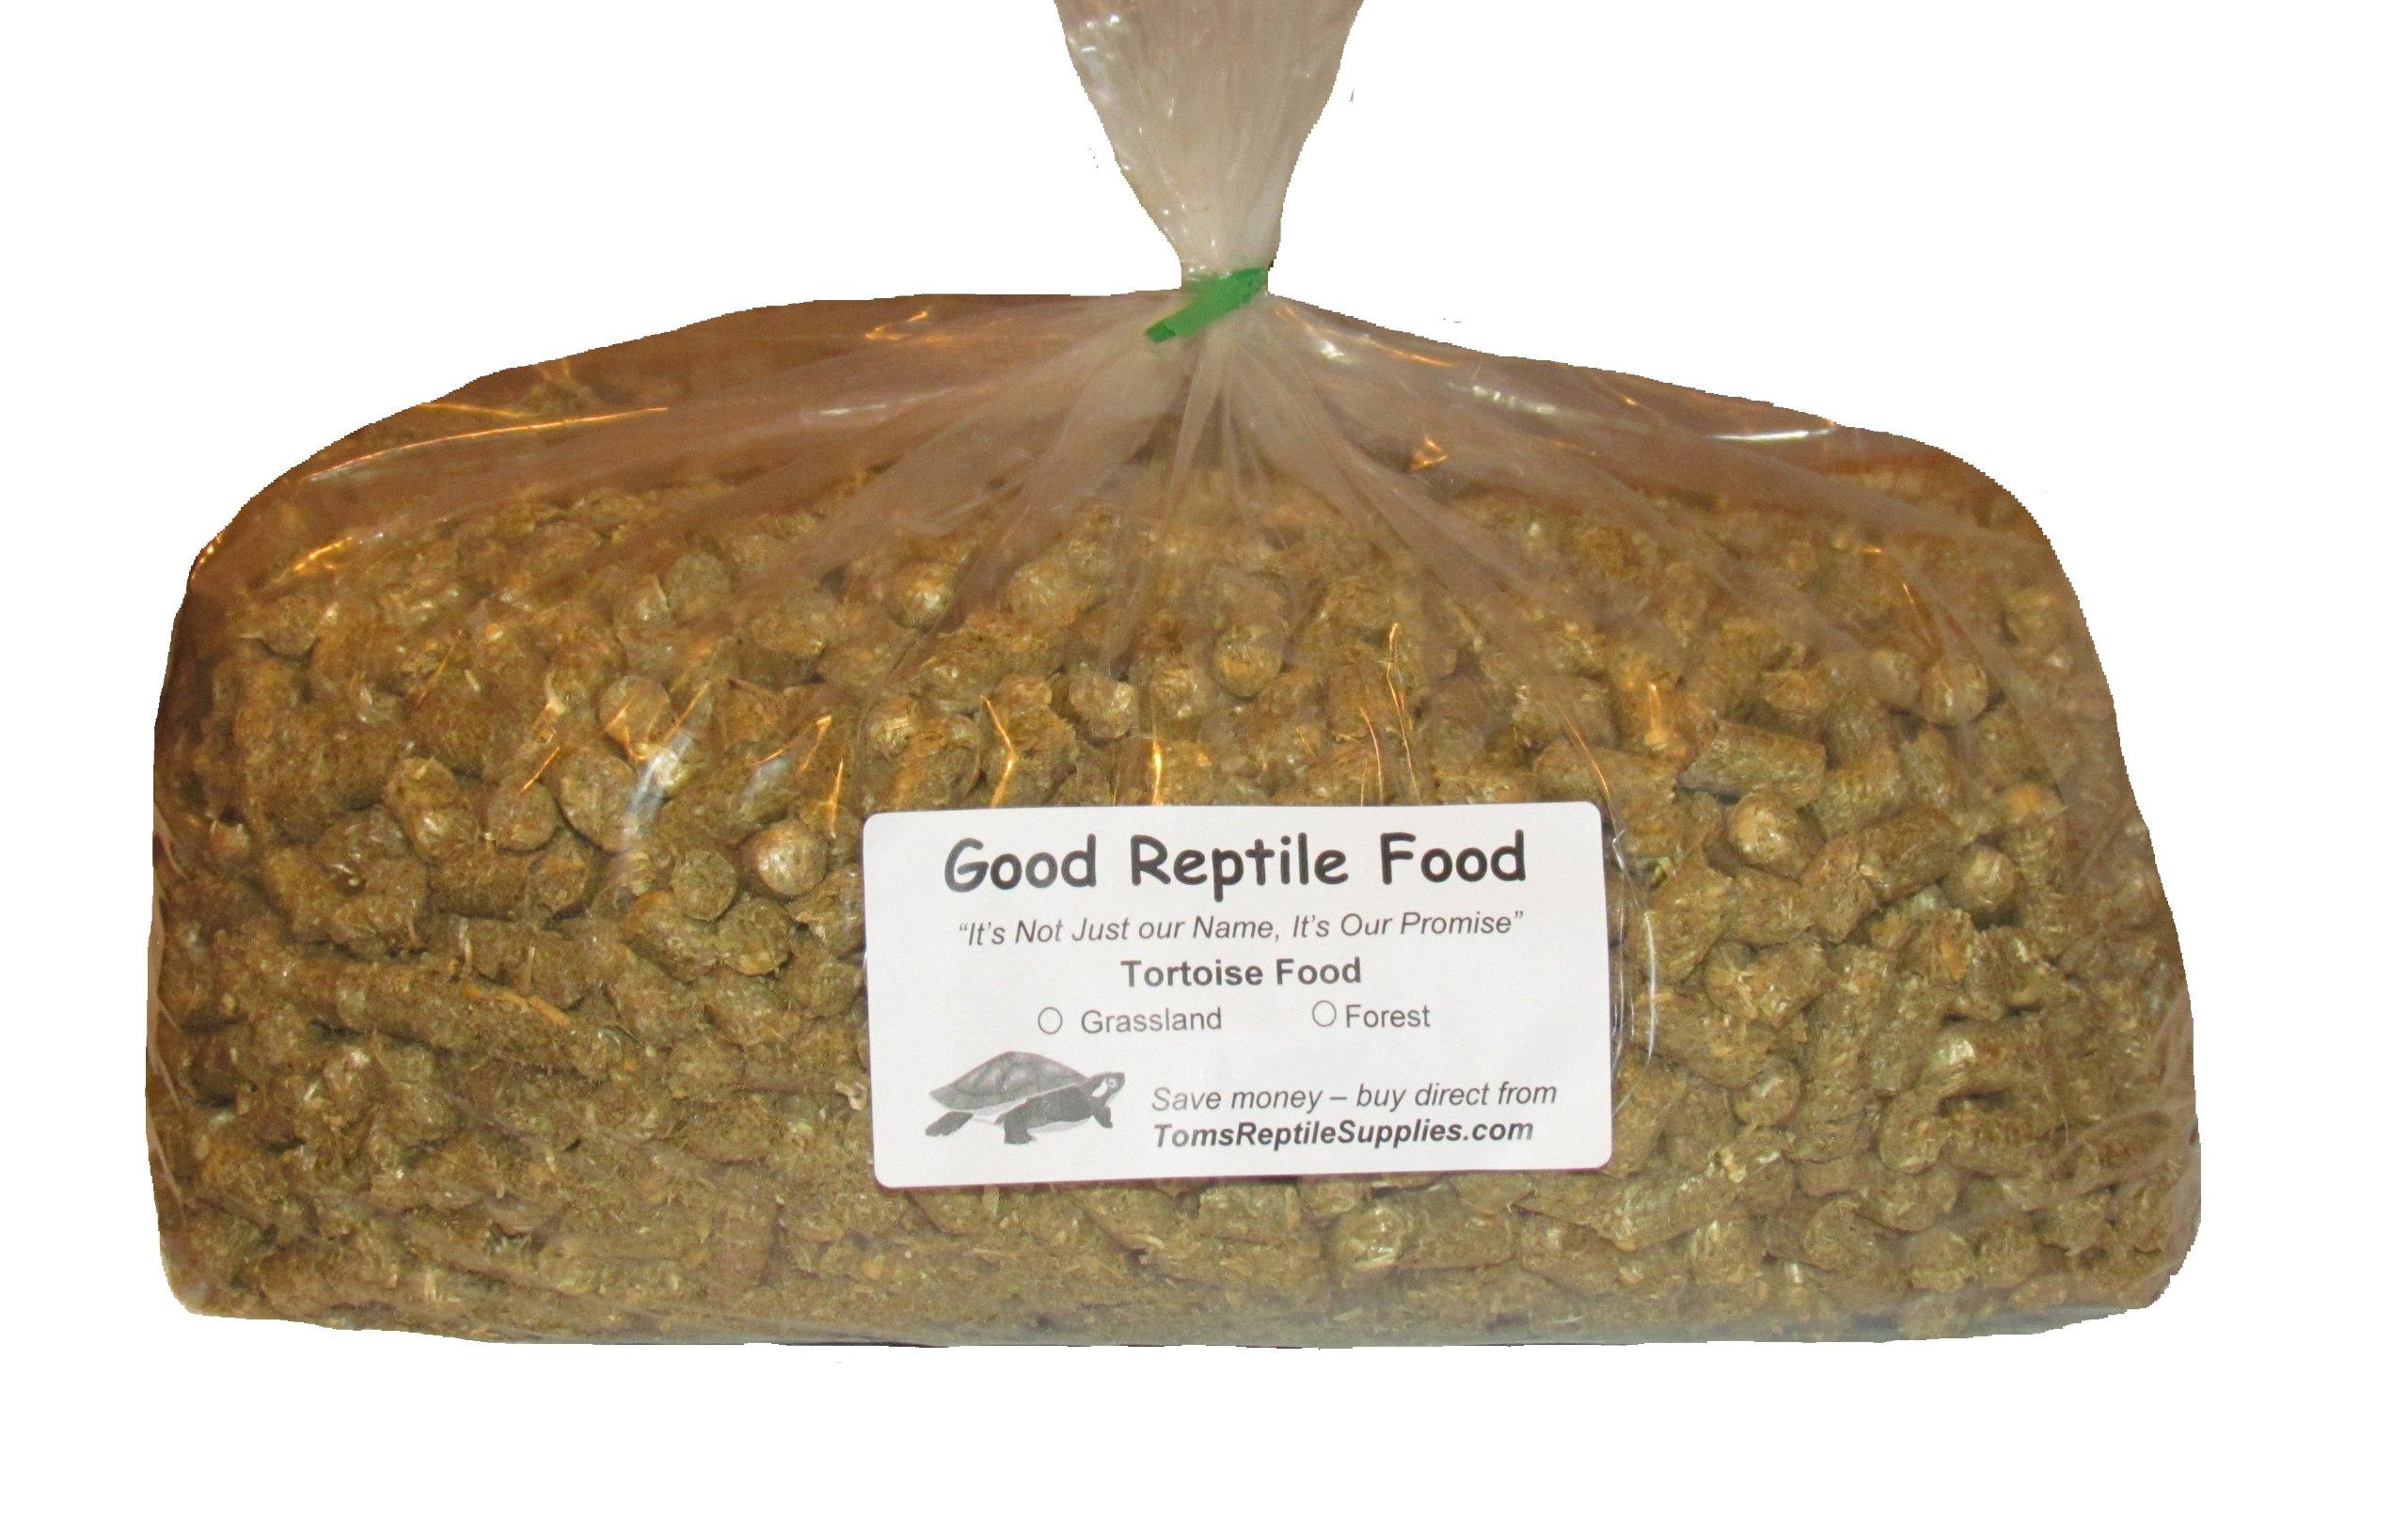 Good Reptile Food Grassland Tortoise Food Bulk 11 Lbs. by Good Reptile Food